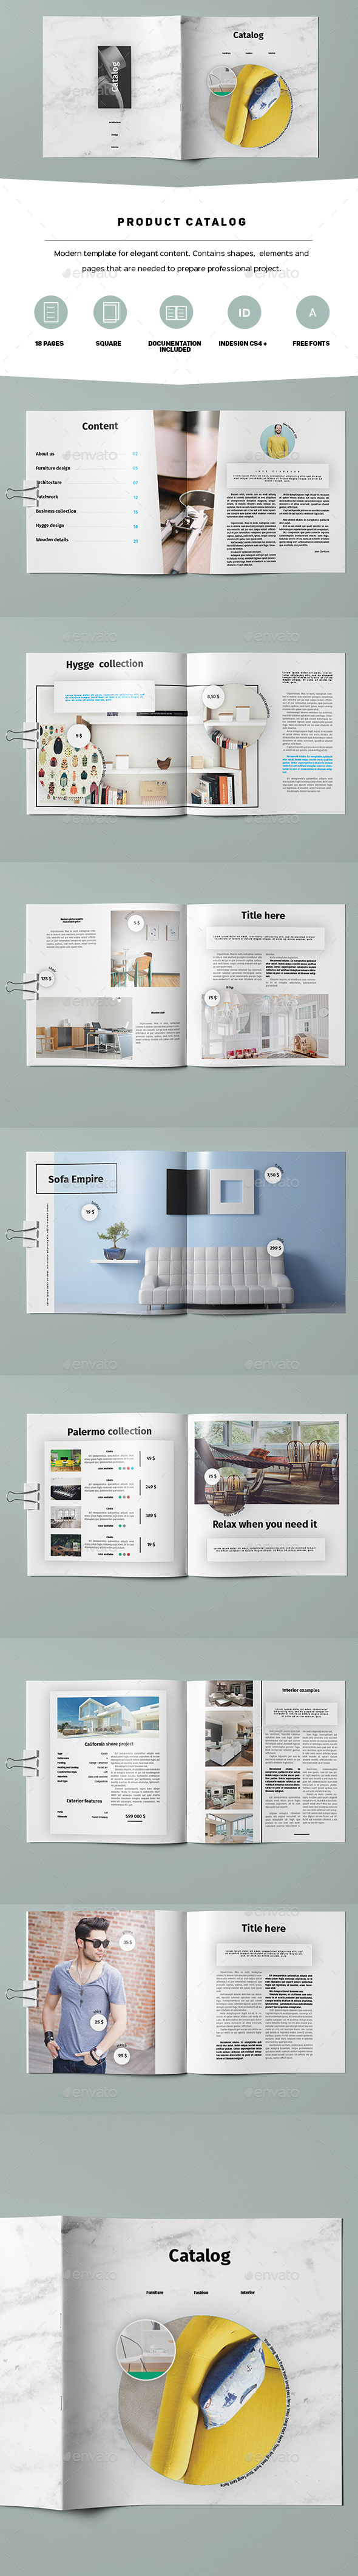 Square Product Catalog 02 - Catalogs Brochures